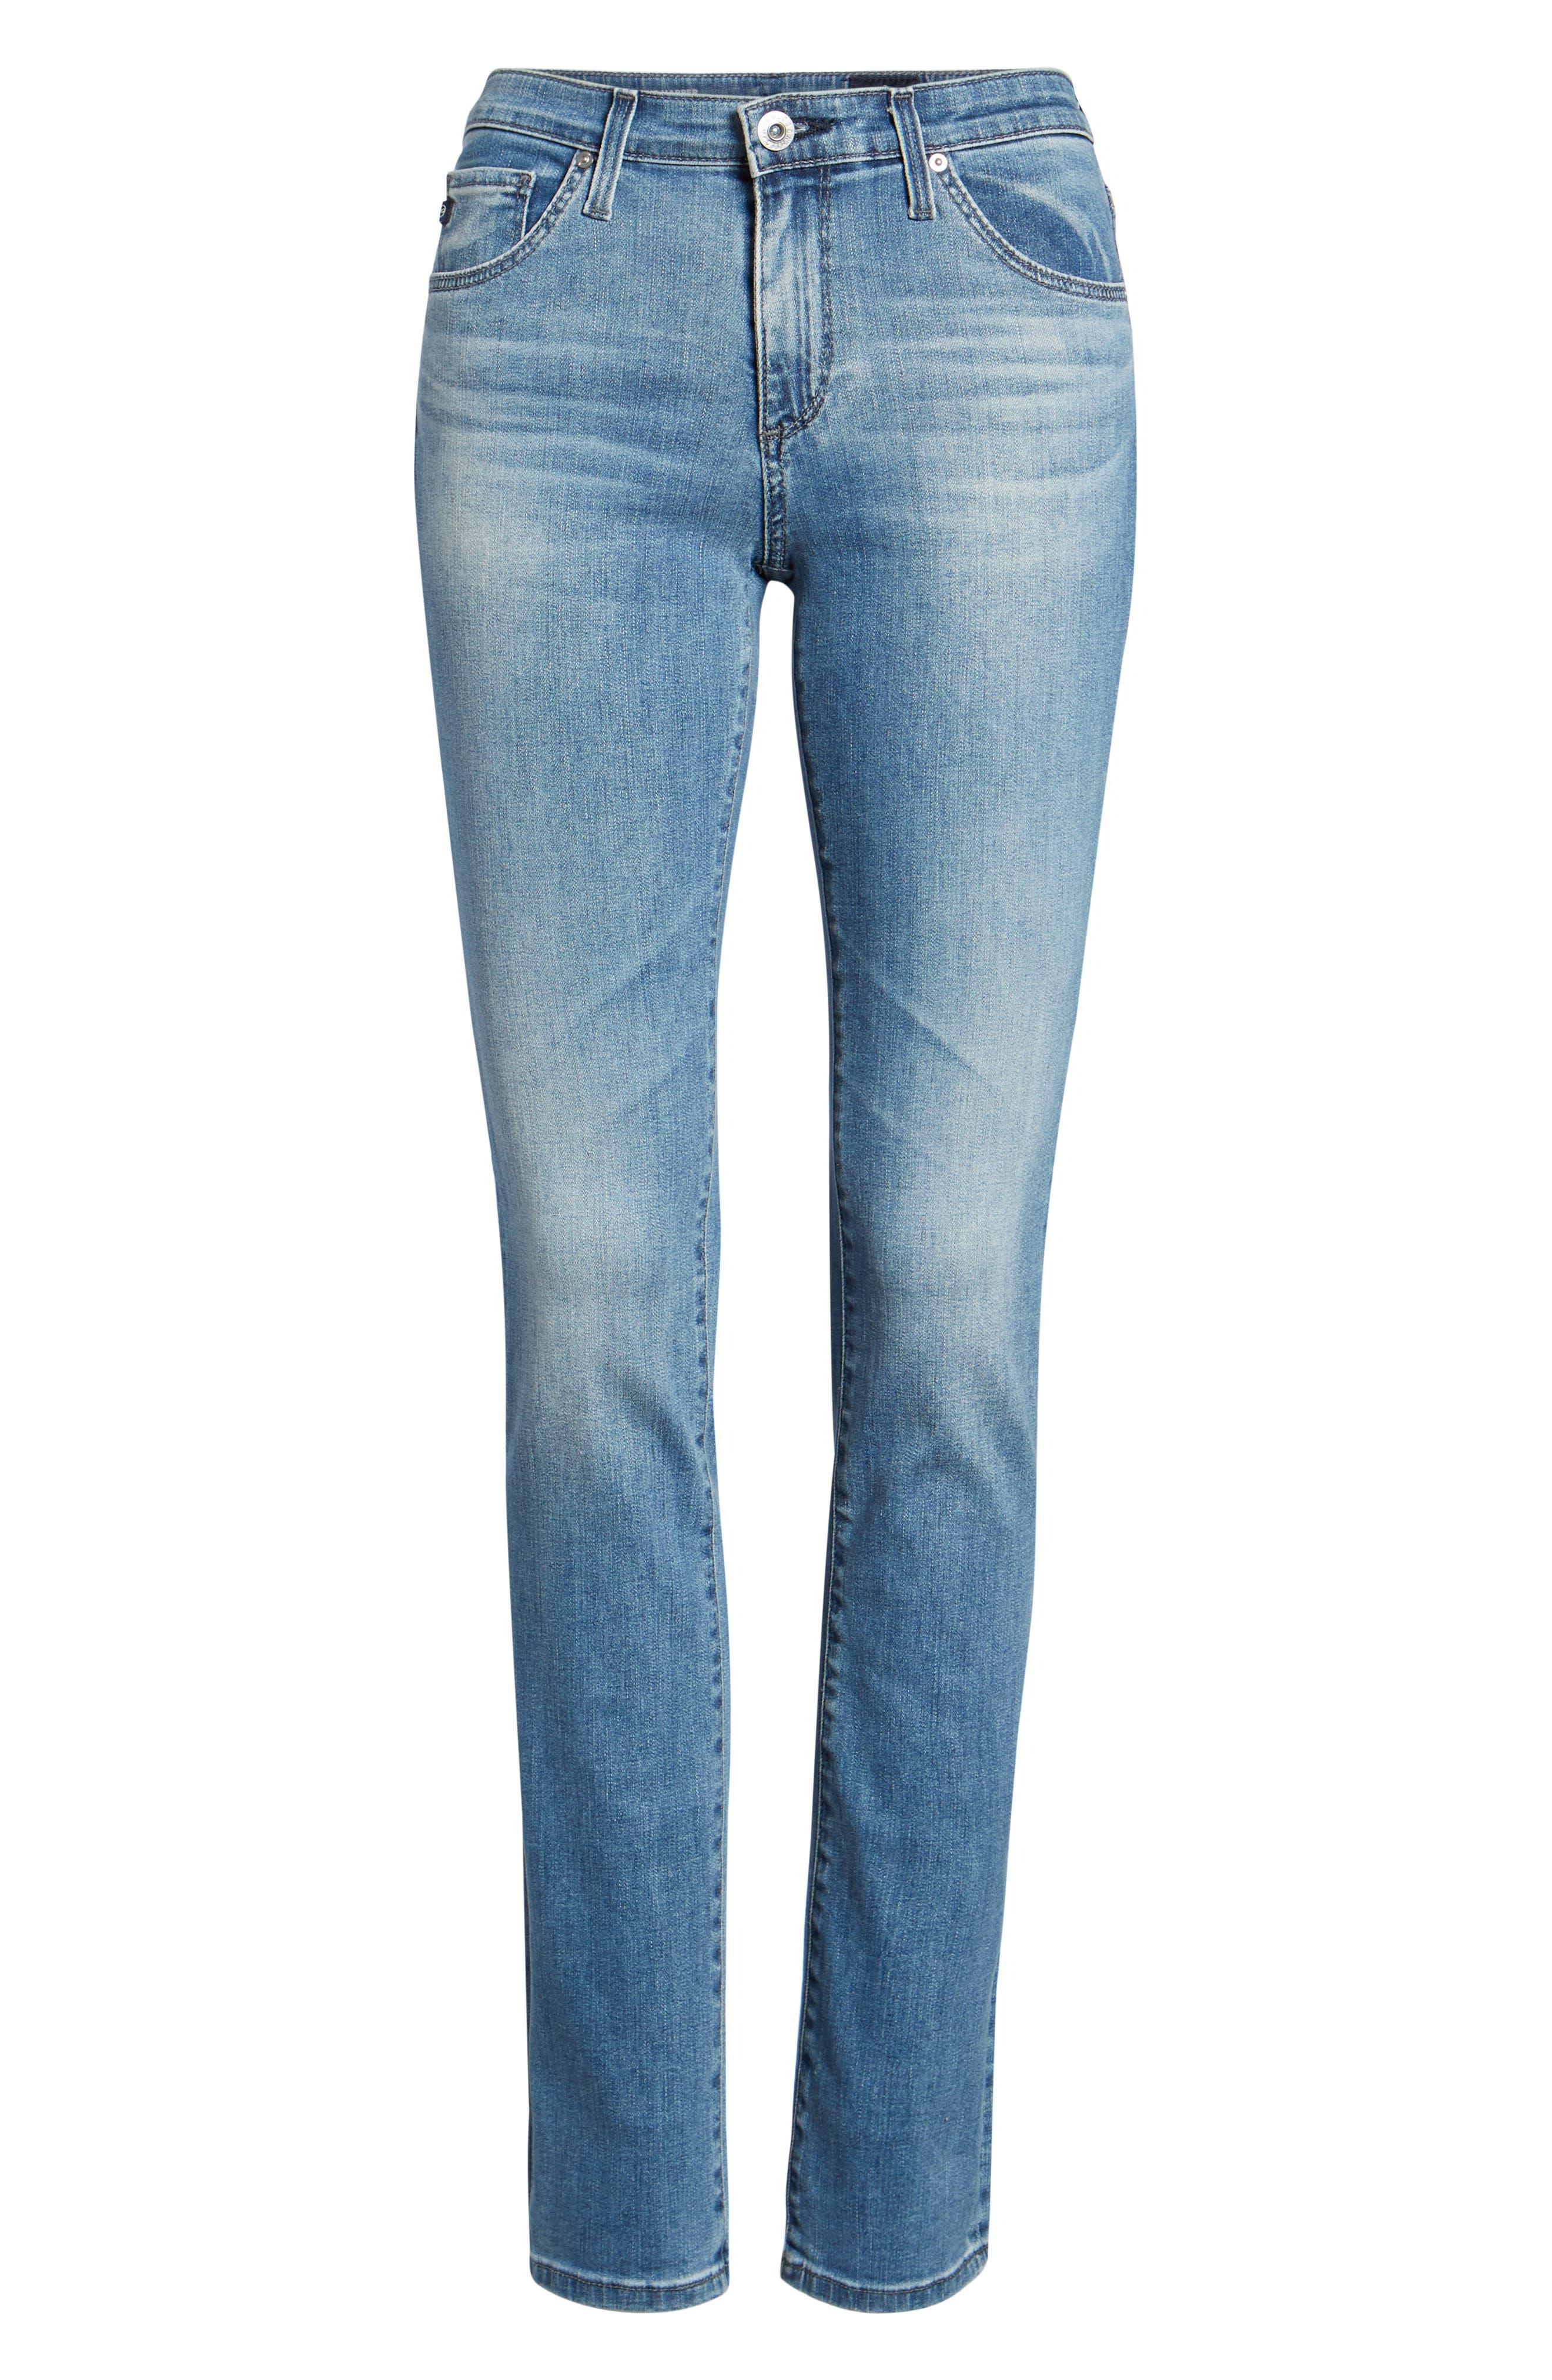 Harper Slim Straight Leg Jeans,                             Alternate thumbnail 7, color,                             Sea Sprite